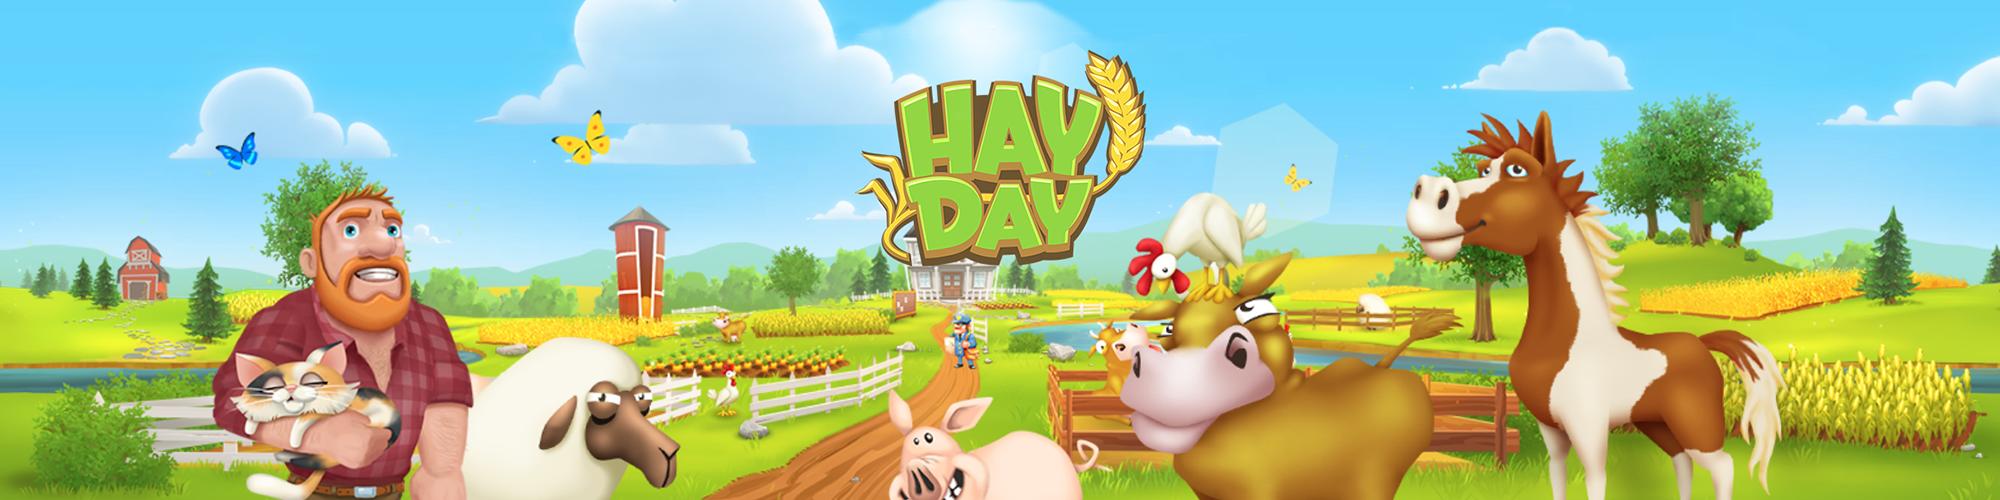 HAY_DAY_HERO_2000x500